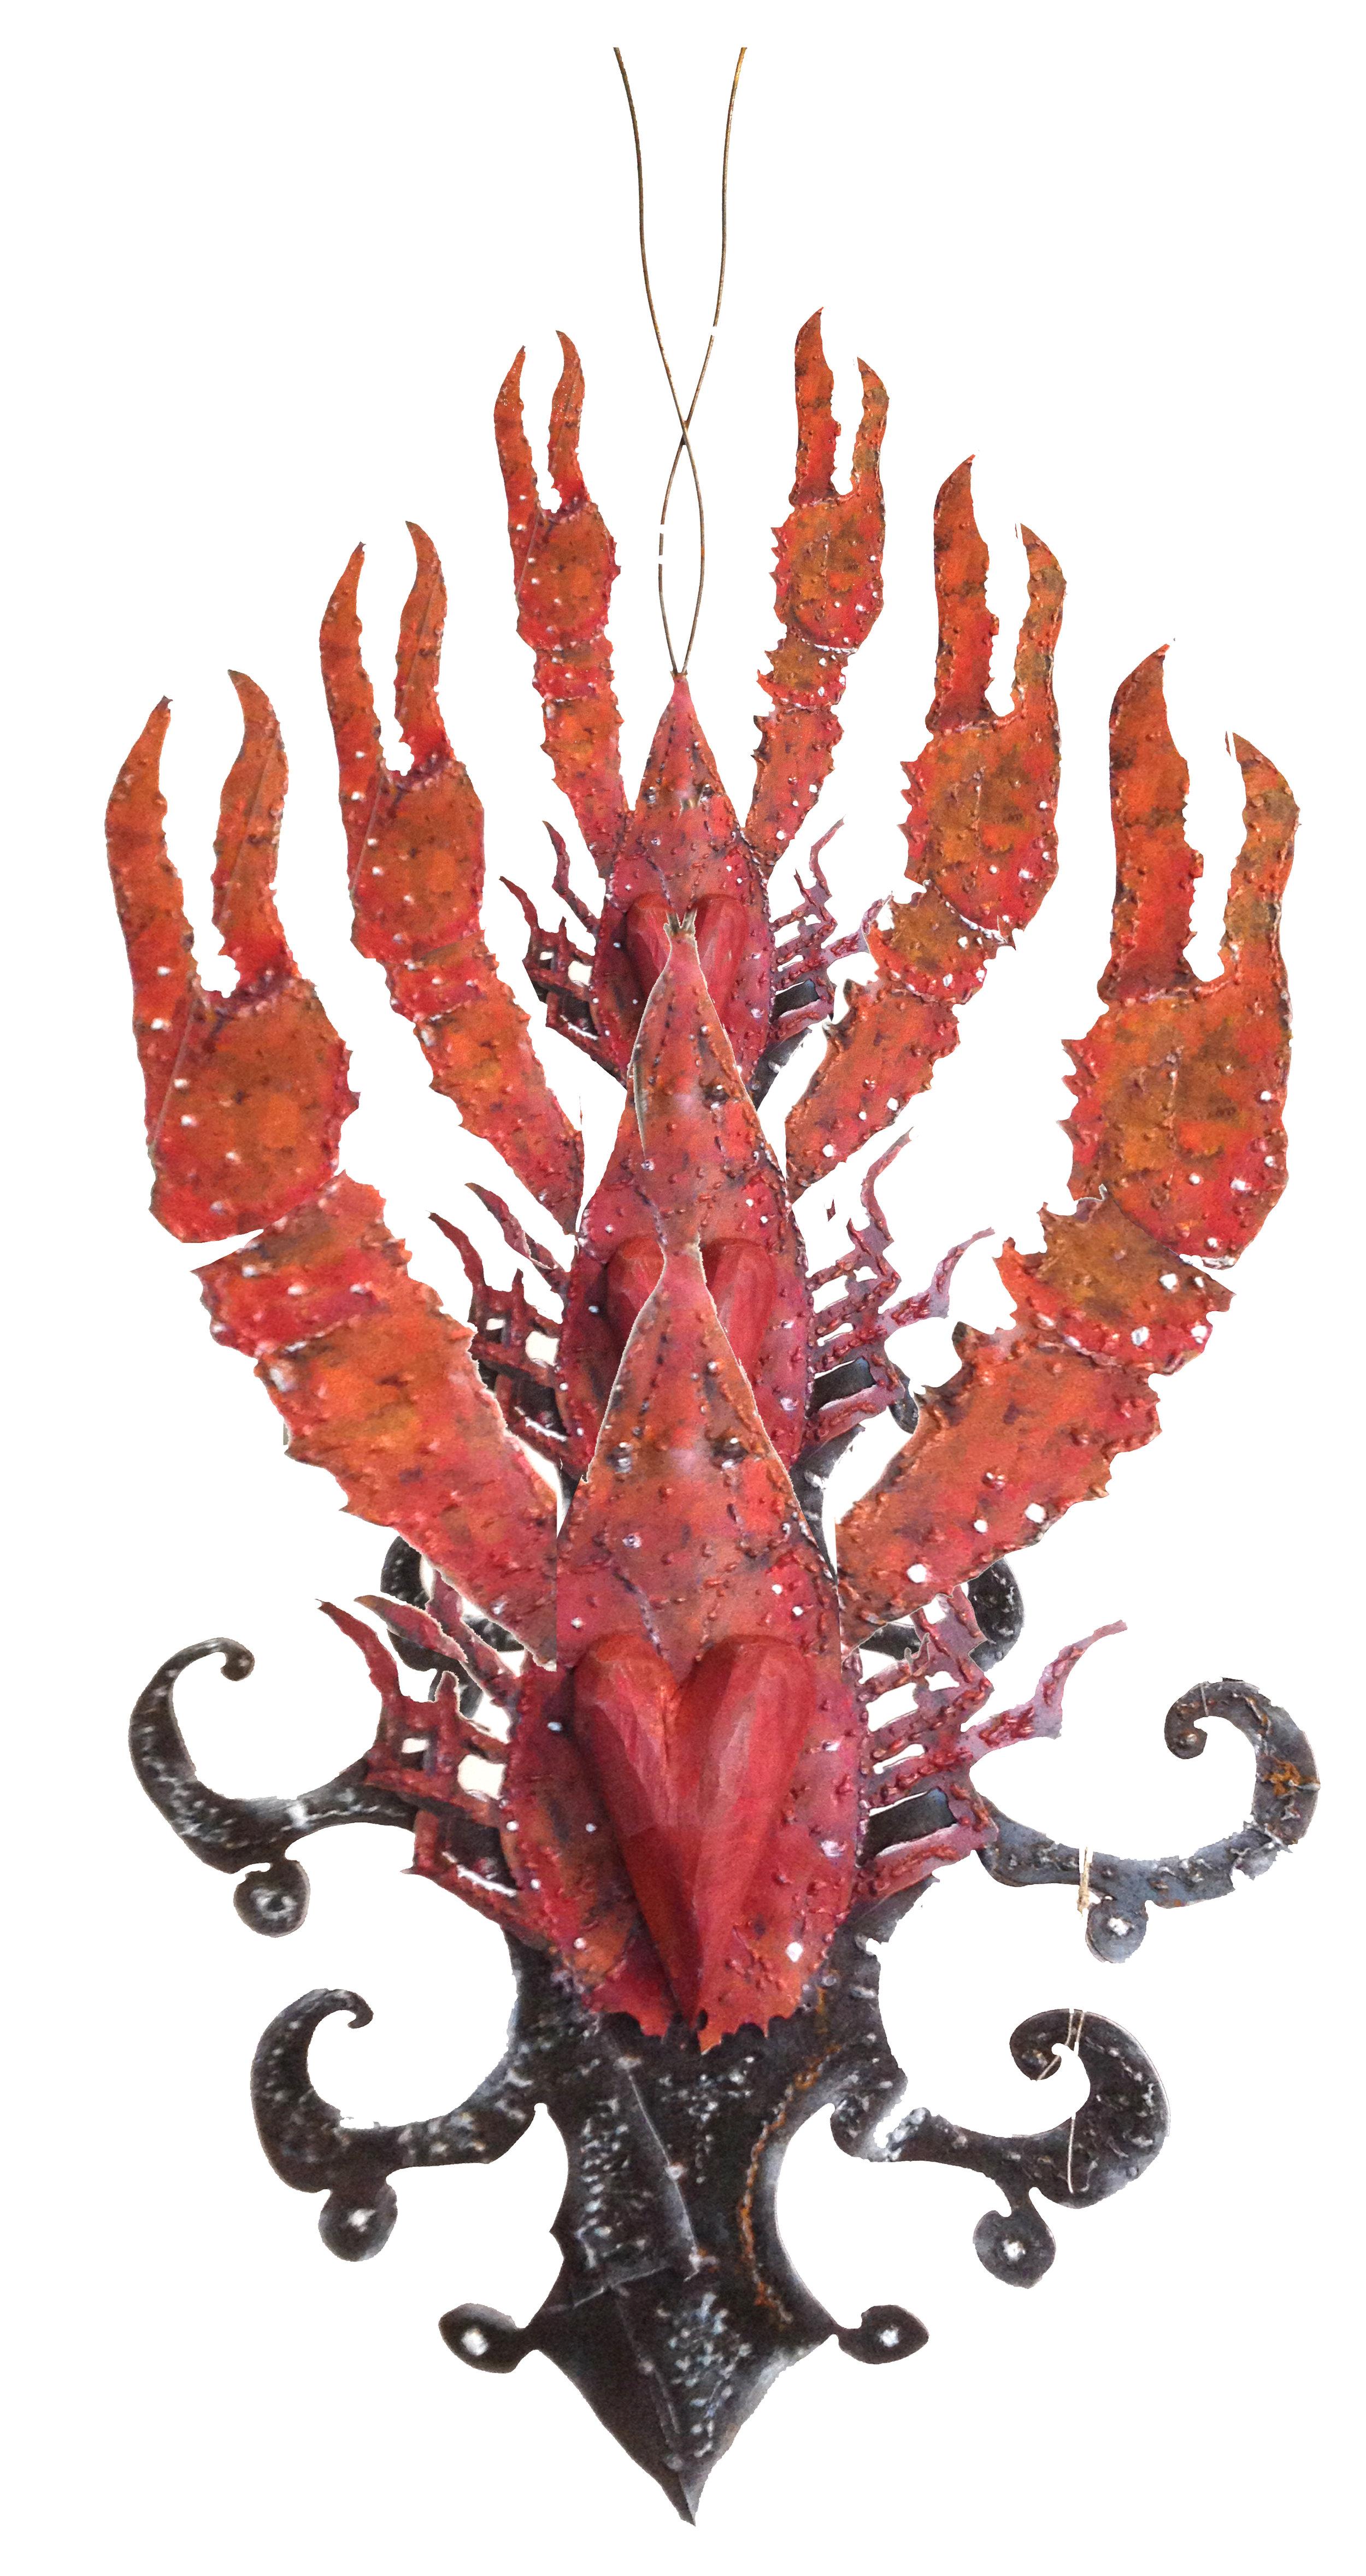 hortel crawfishproject.jpg